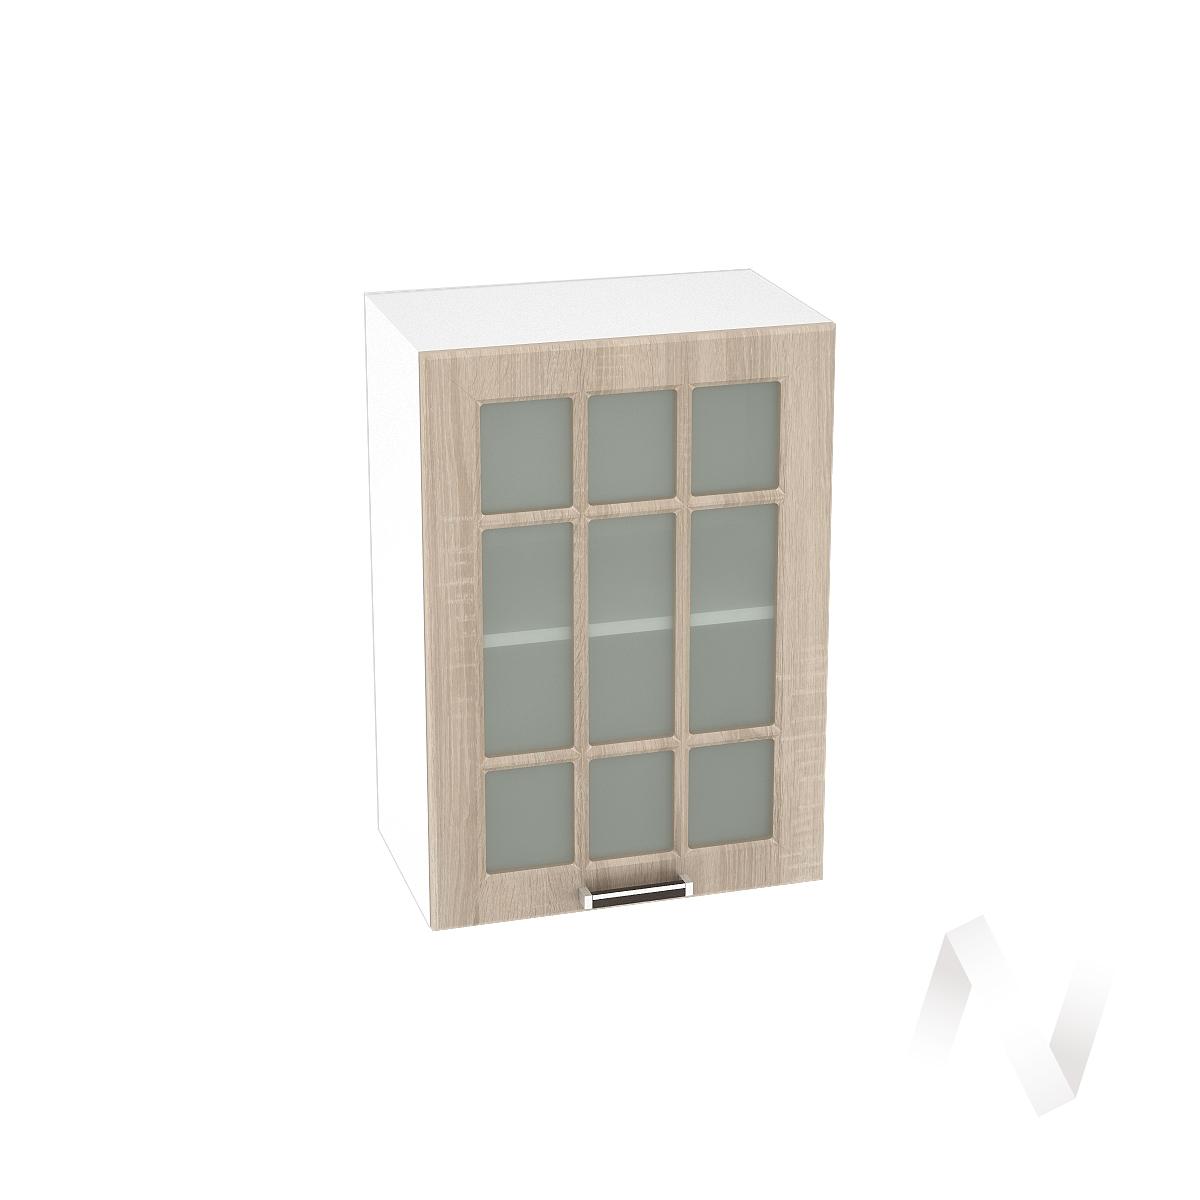 "Кухня ""Прага"": Шкаф верхний со стеклом 500, ШВС 500 (дуб сонома/корпус белый)"